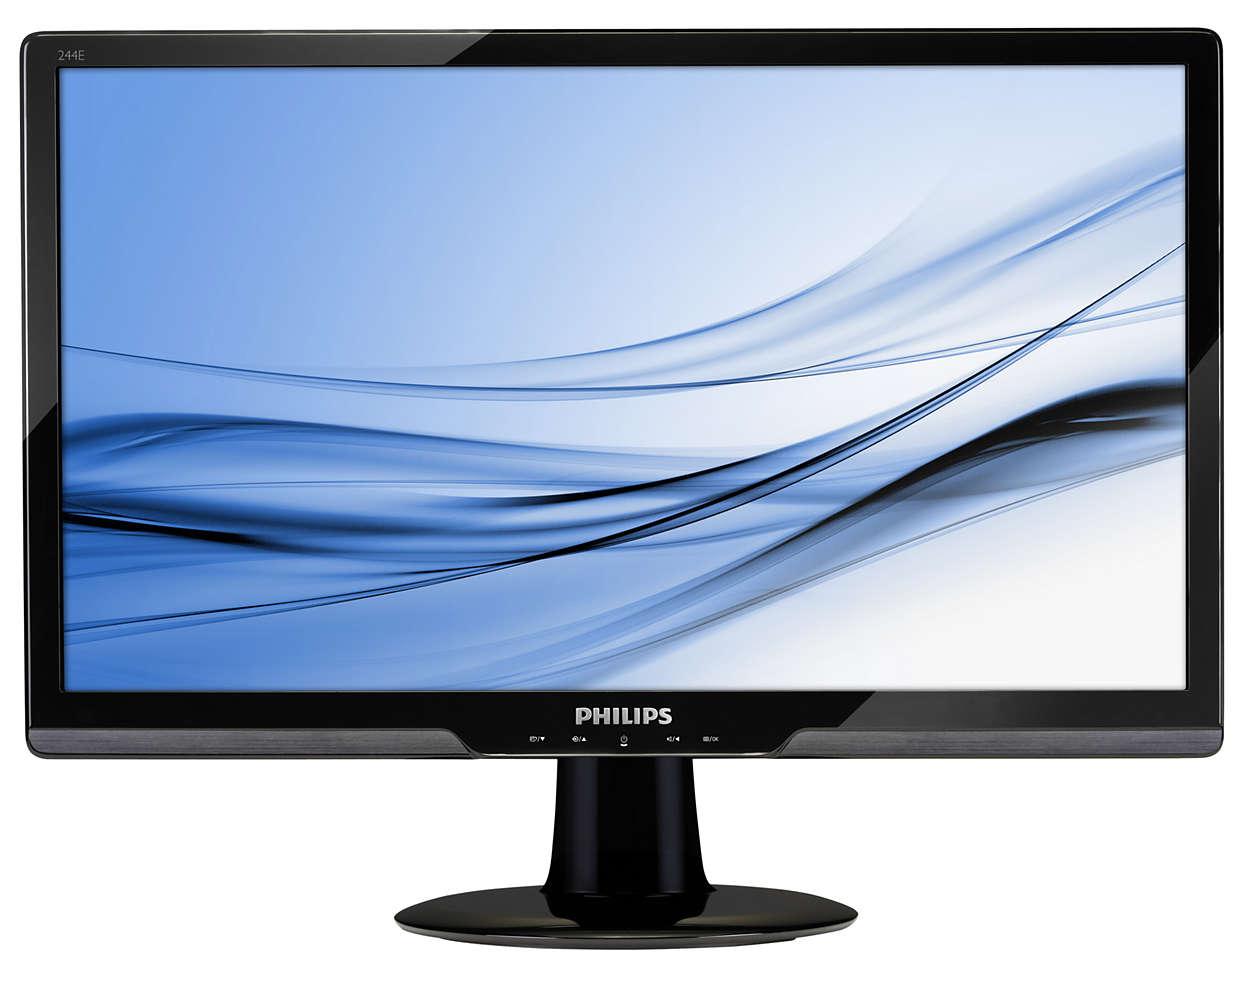 Divertisment excelent pe monitorul HDMI mare cu LED-uri